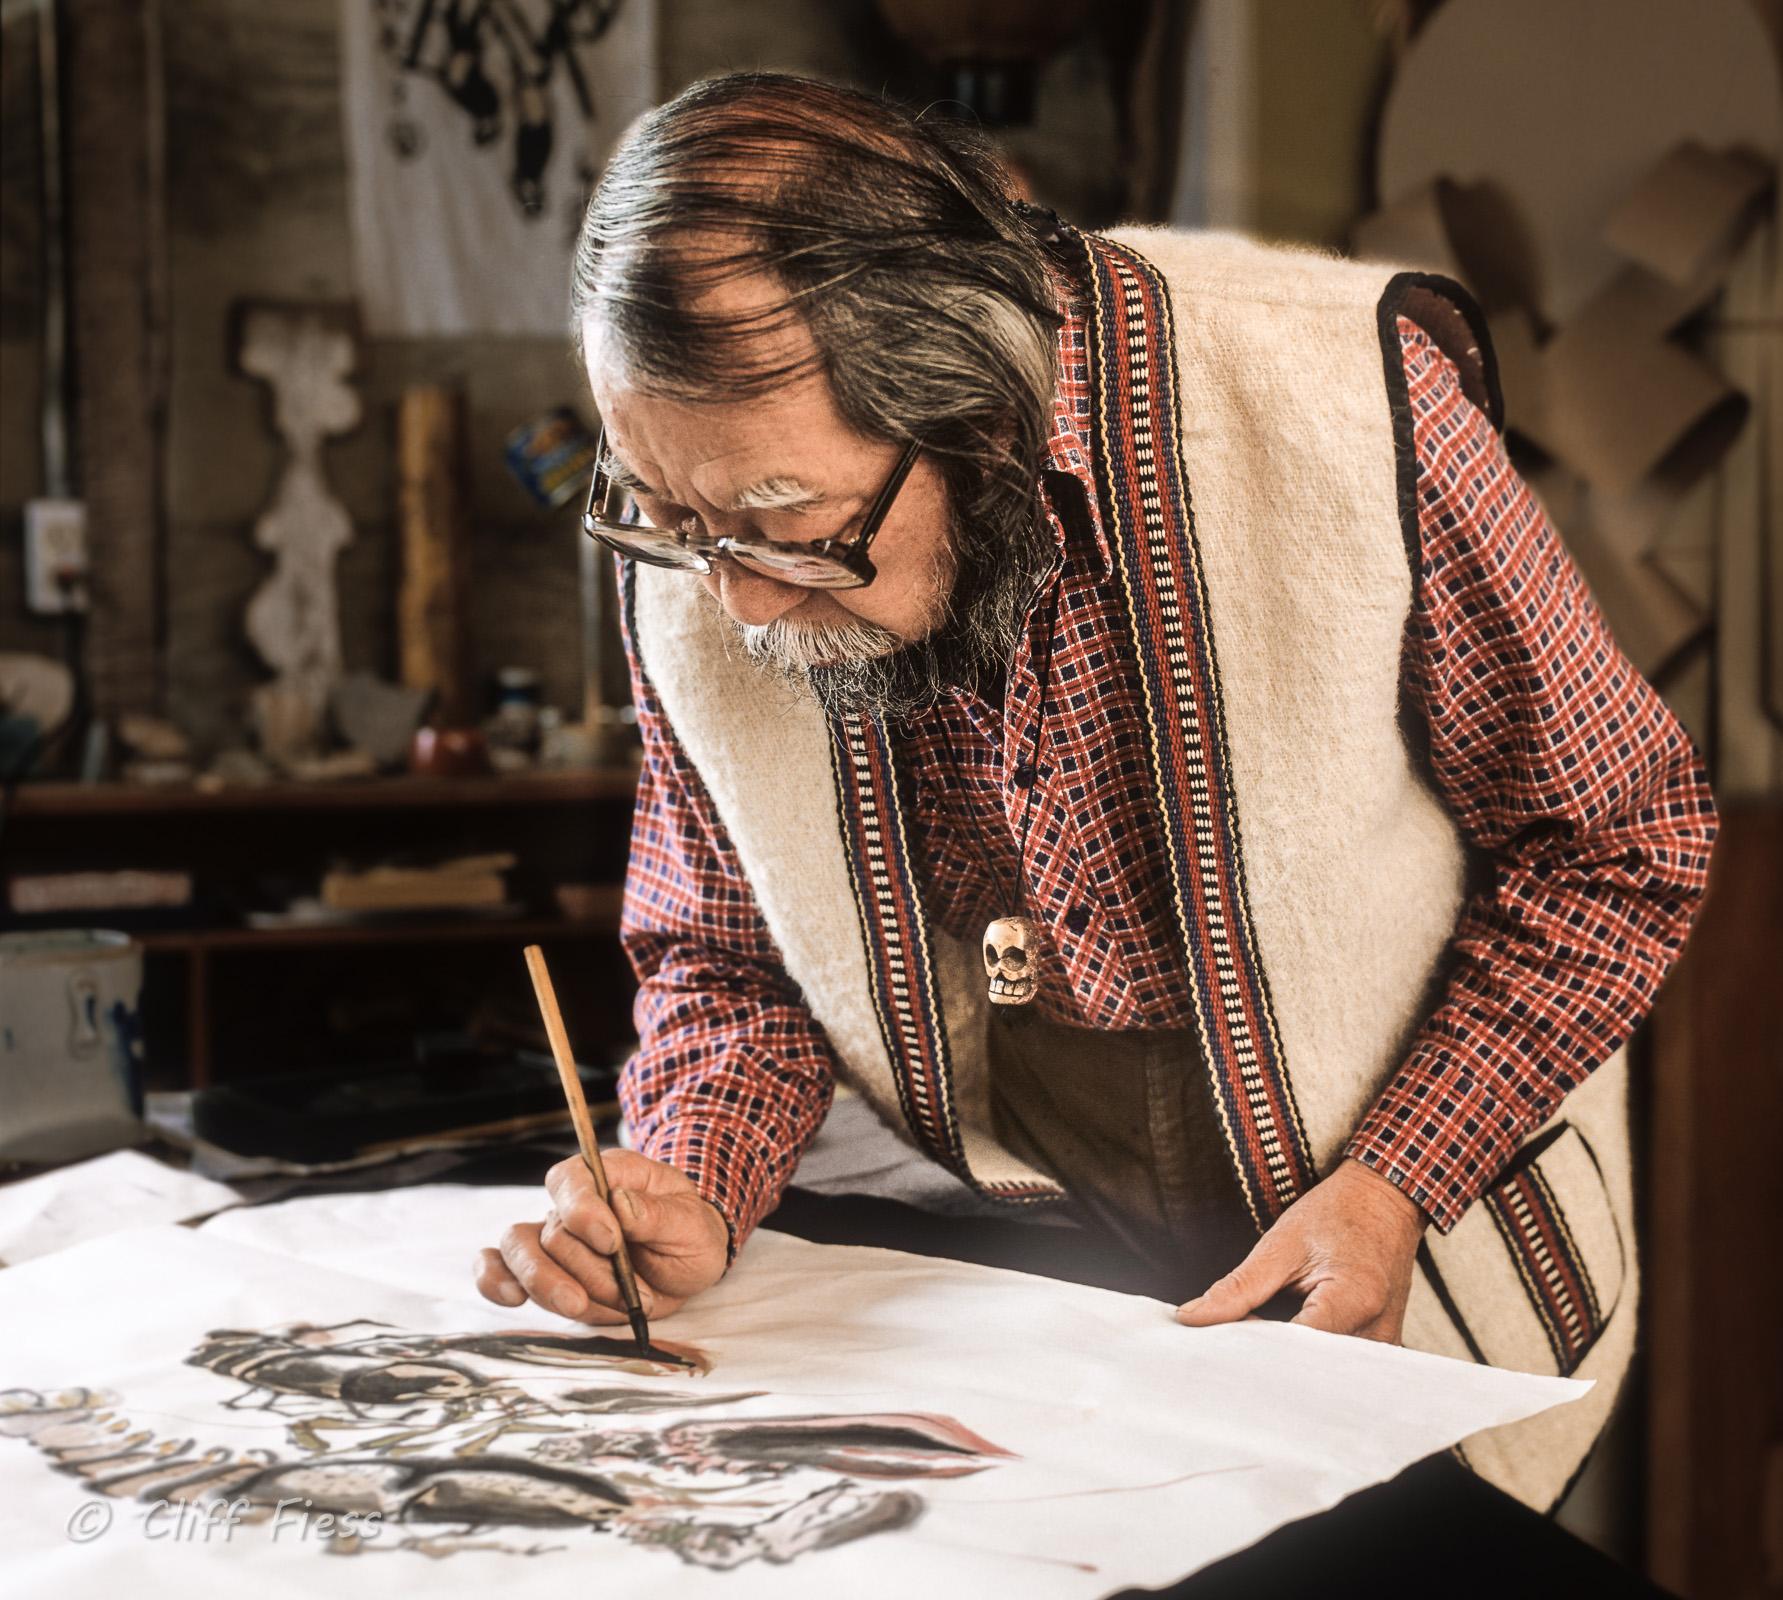 A portrait of the eminent artist George Tsutakawa.